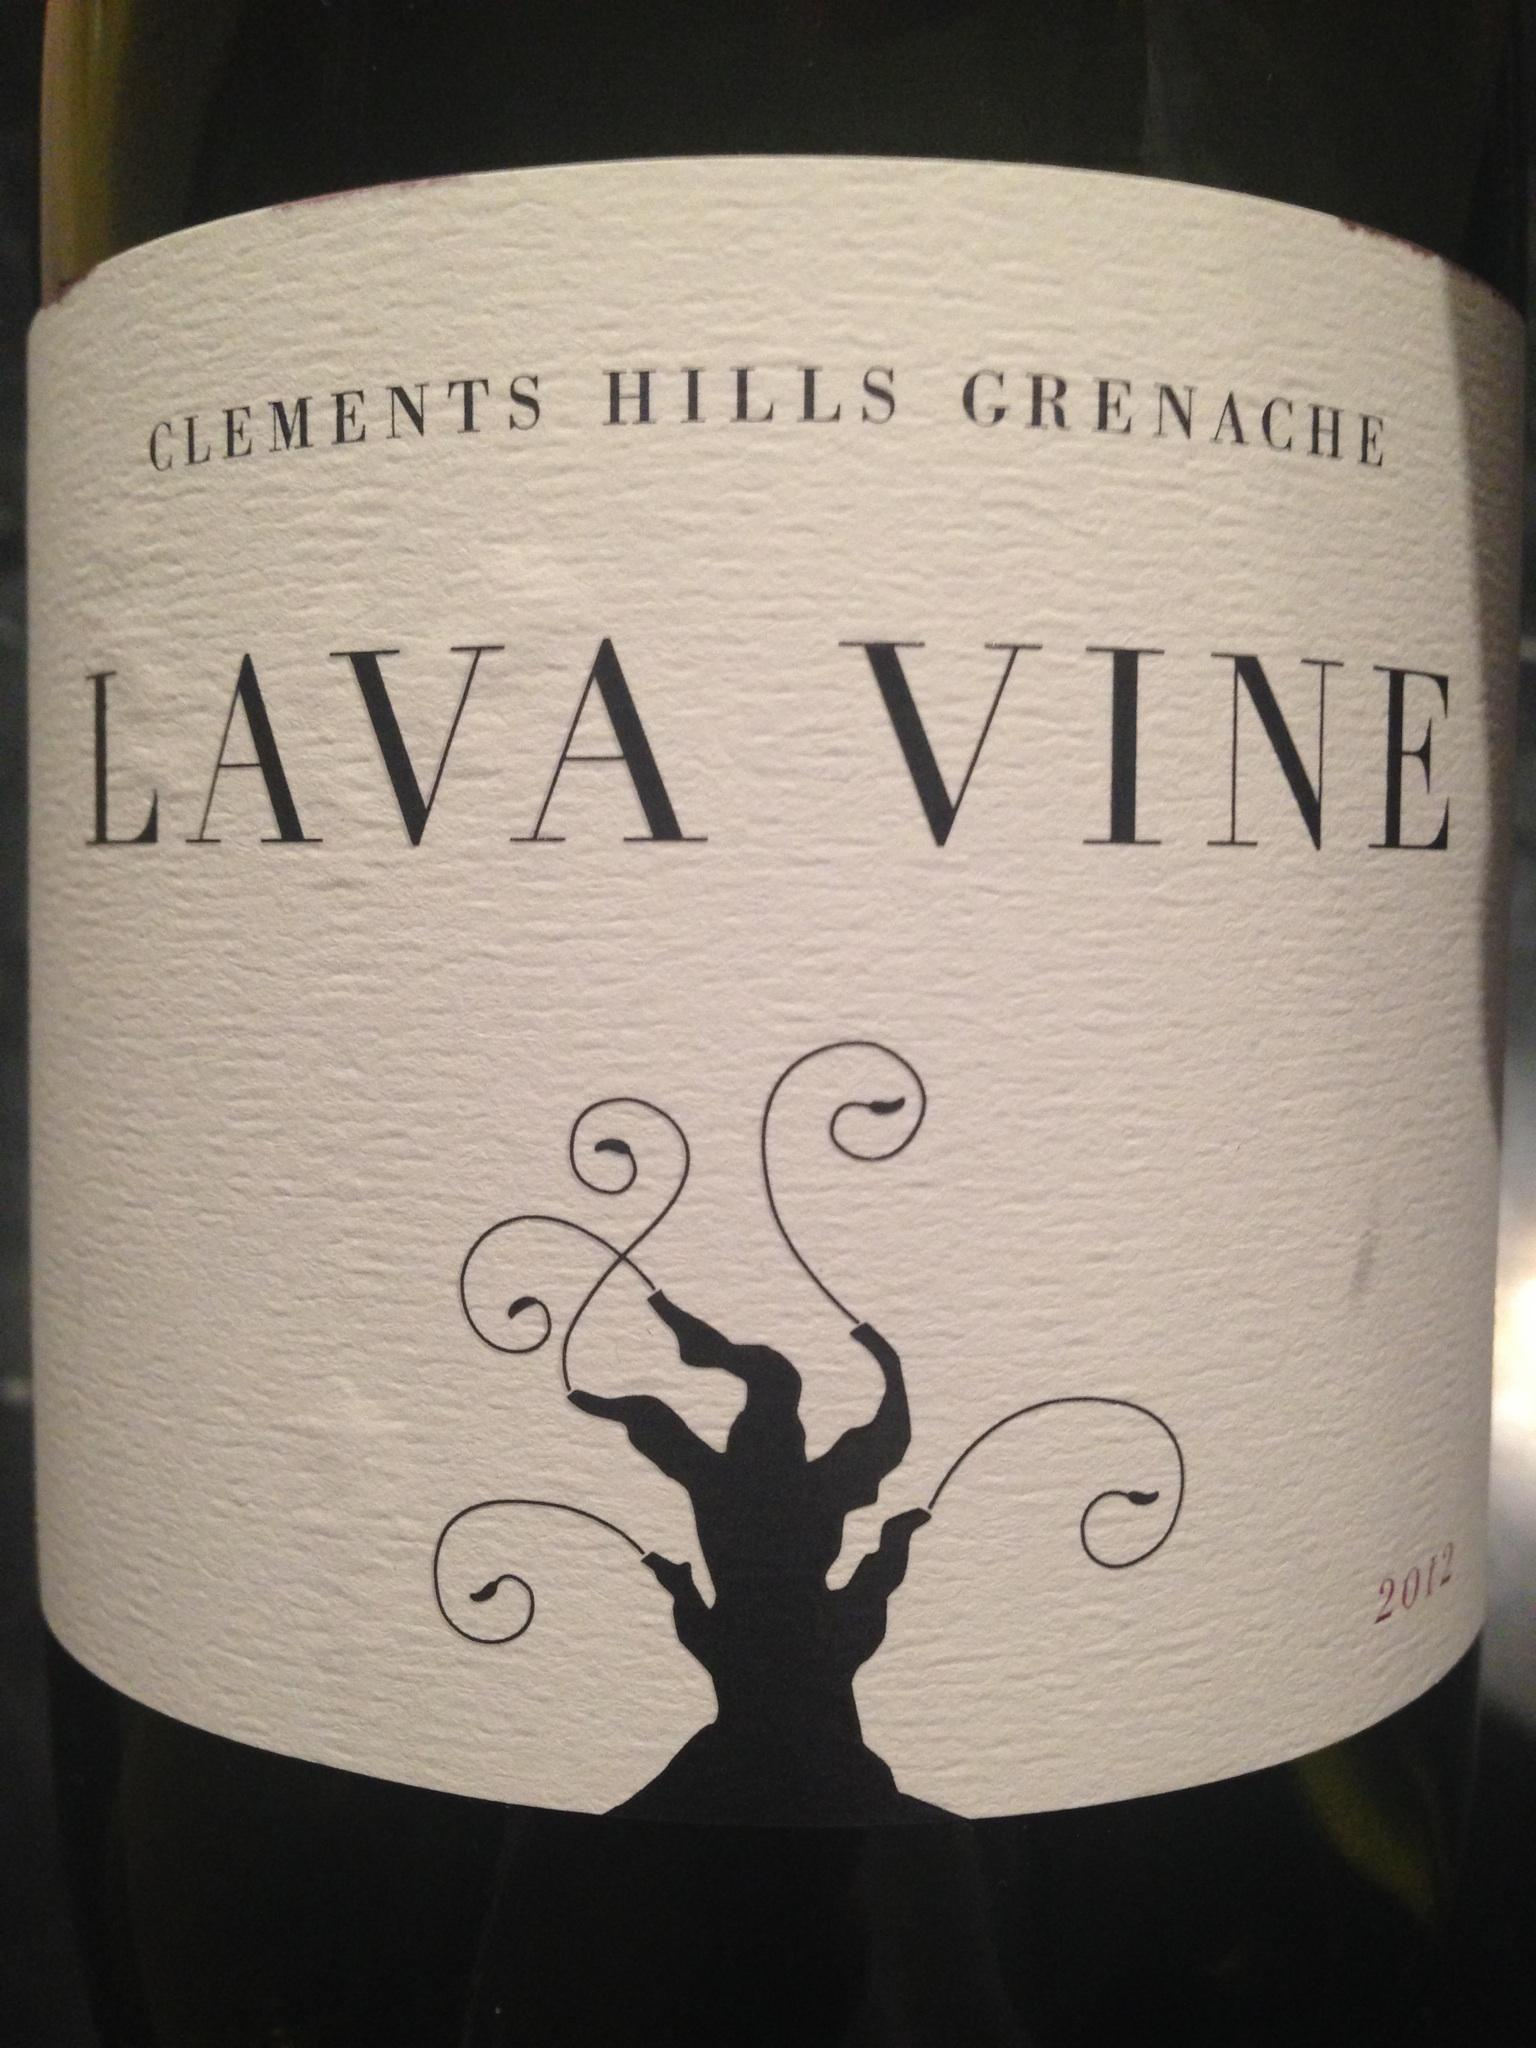 Lava Vine _ 2012 Clement Hills Grenache.jpg